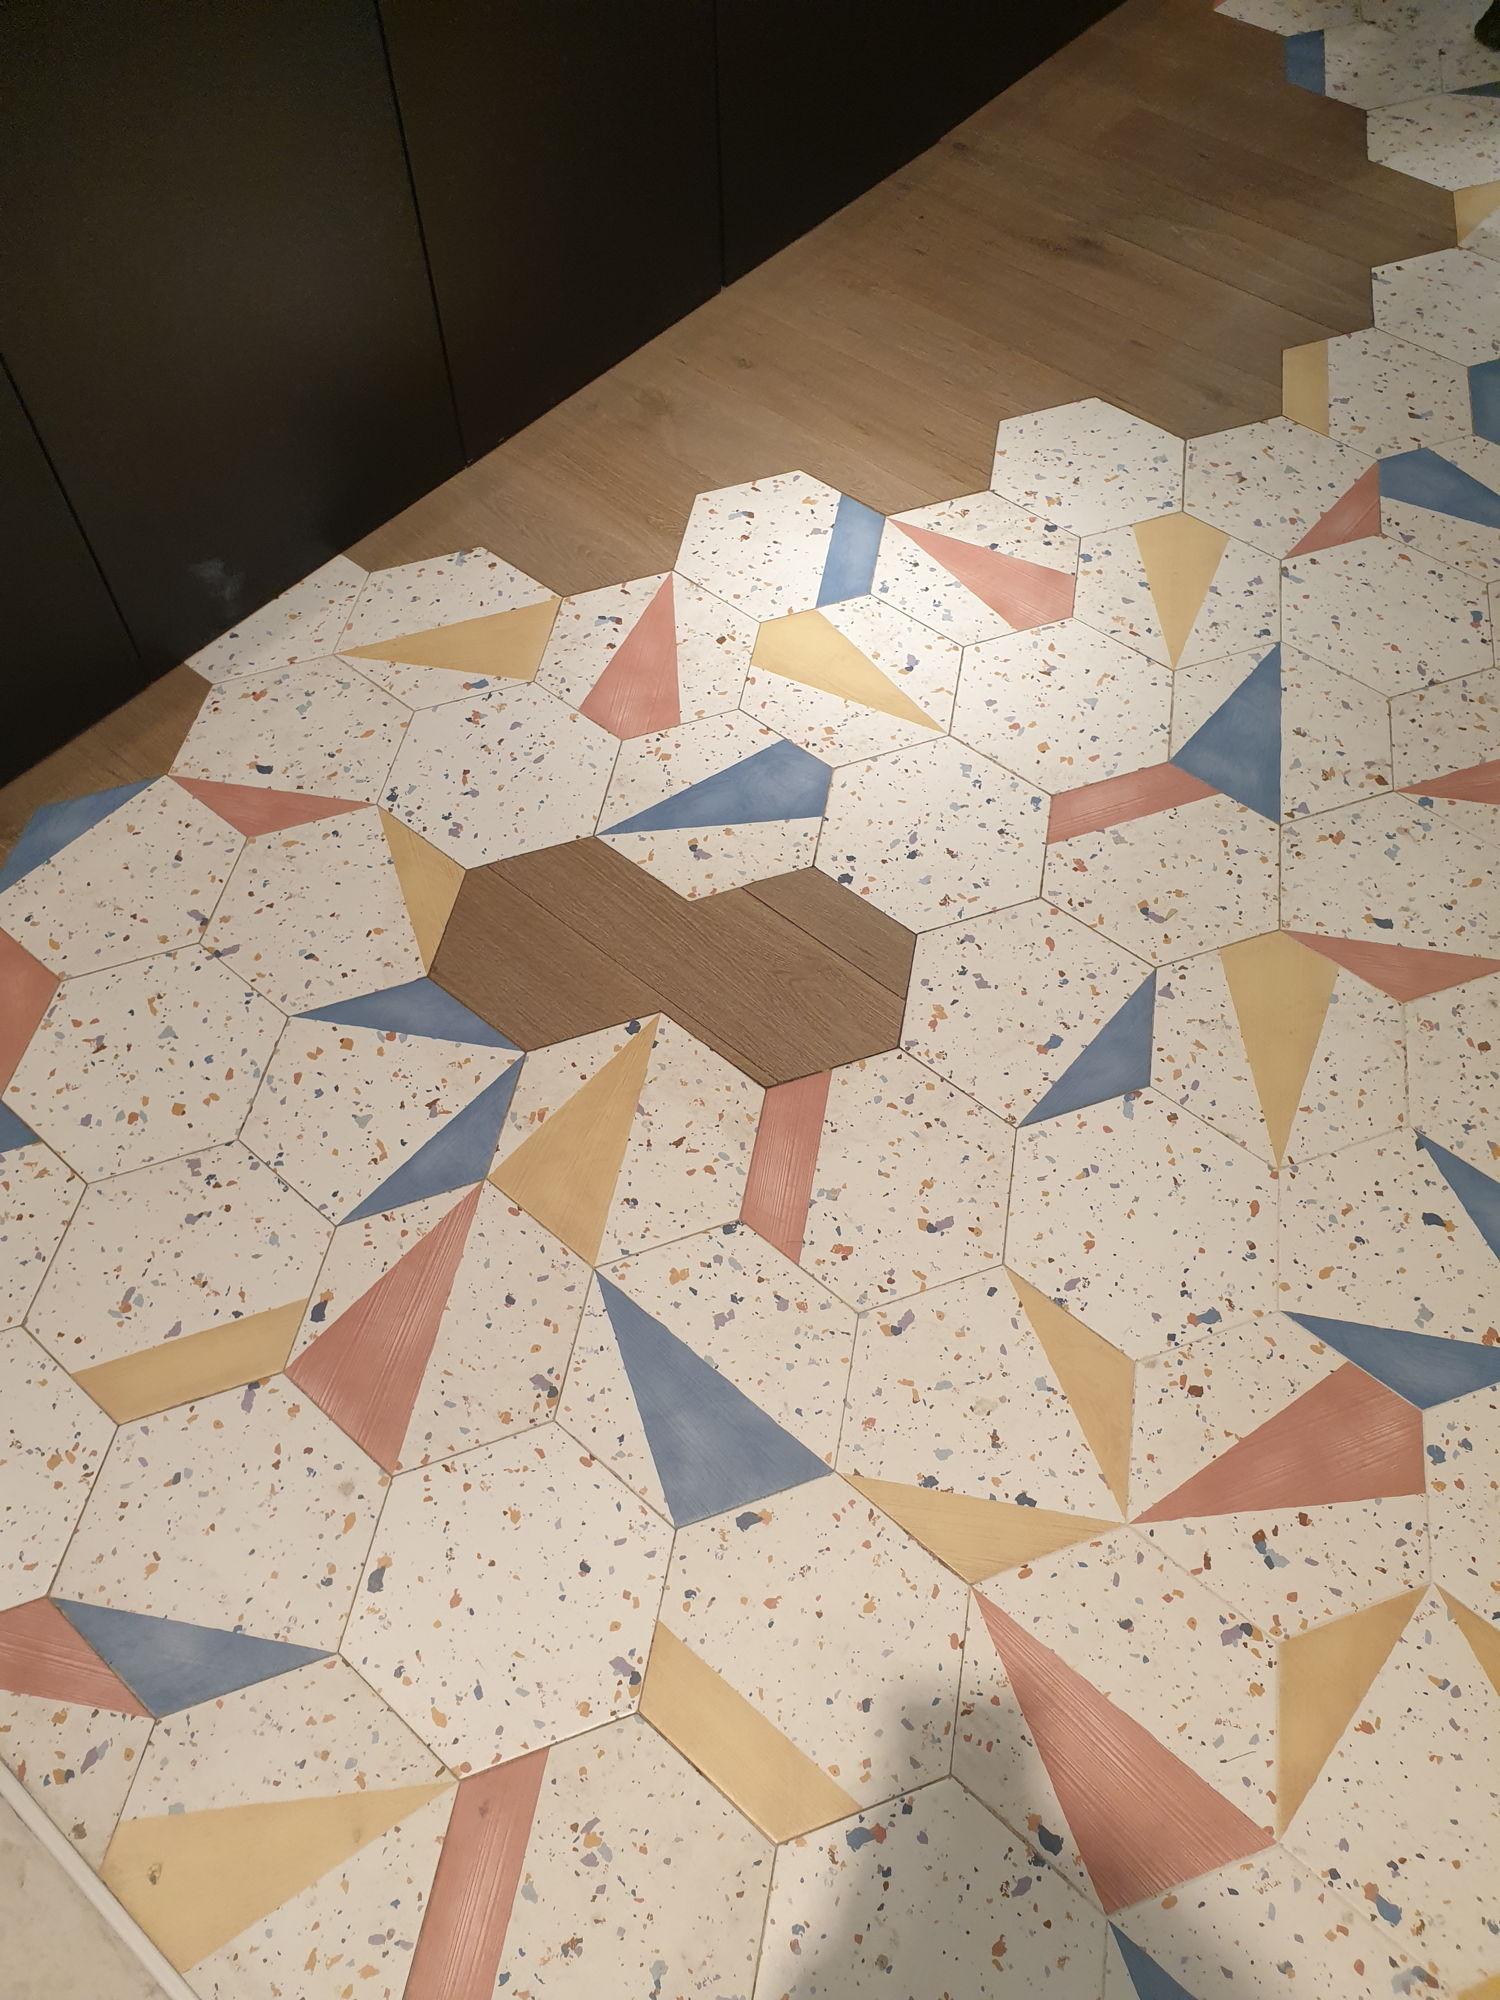 Płytki heksagonalne Aparici Stracciatella lastryko kolorowe